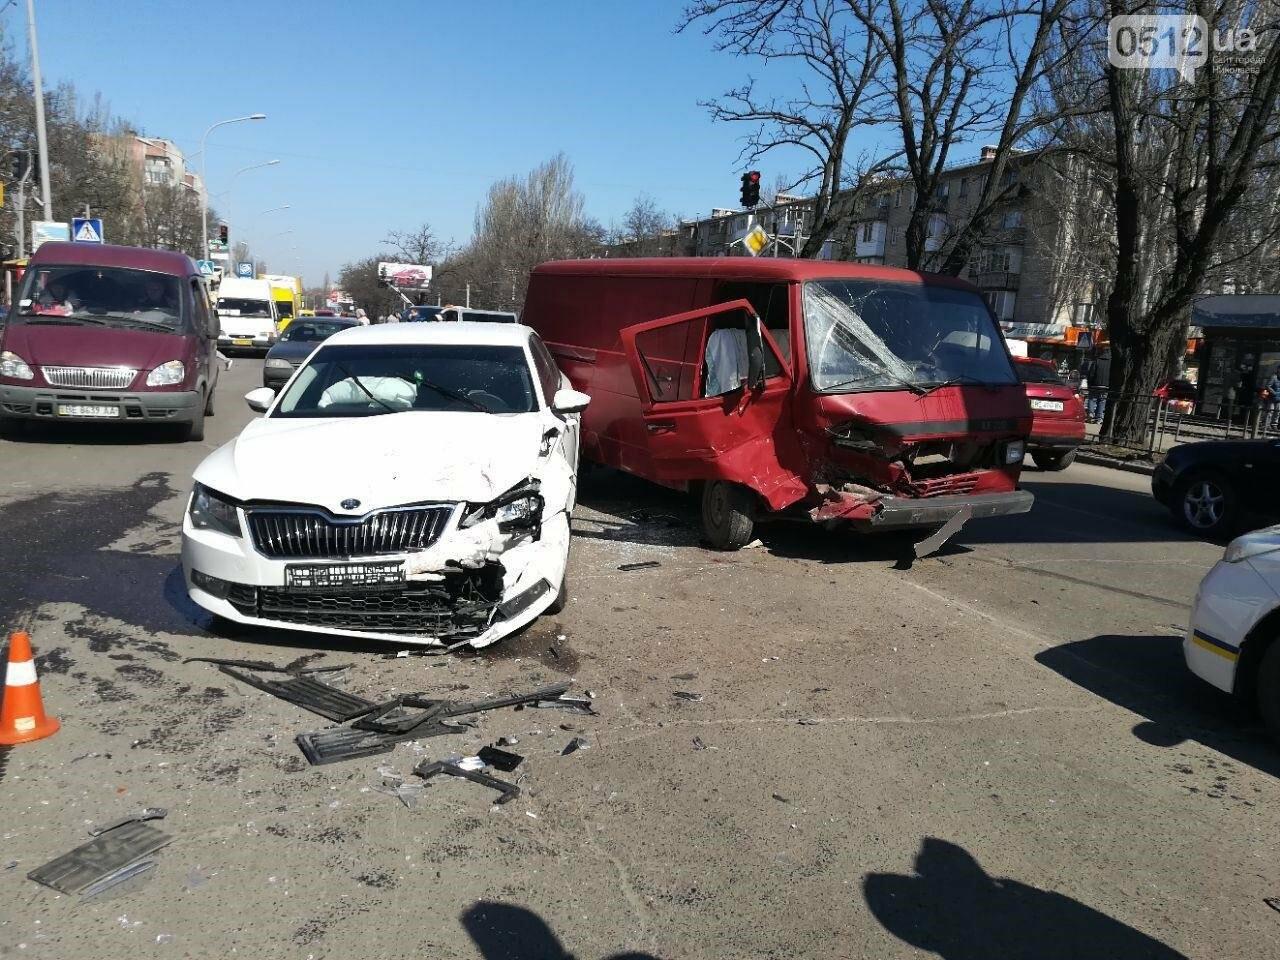 Авария в Николаеве: в результате ДТП пострадало четыре человека, среди них ребенок, - ФОТО, фото-3